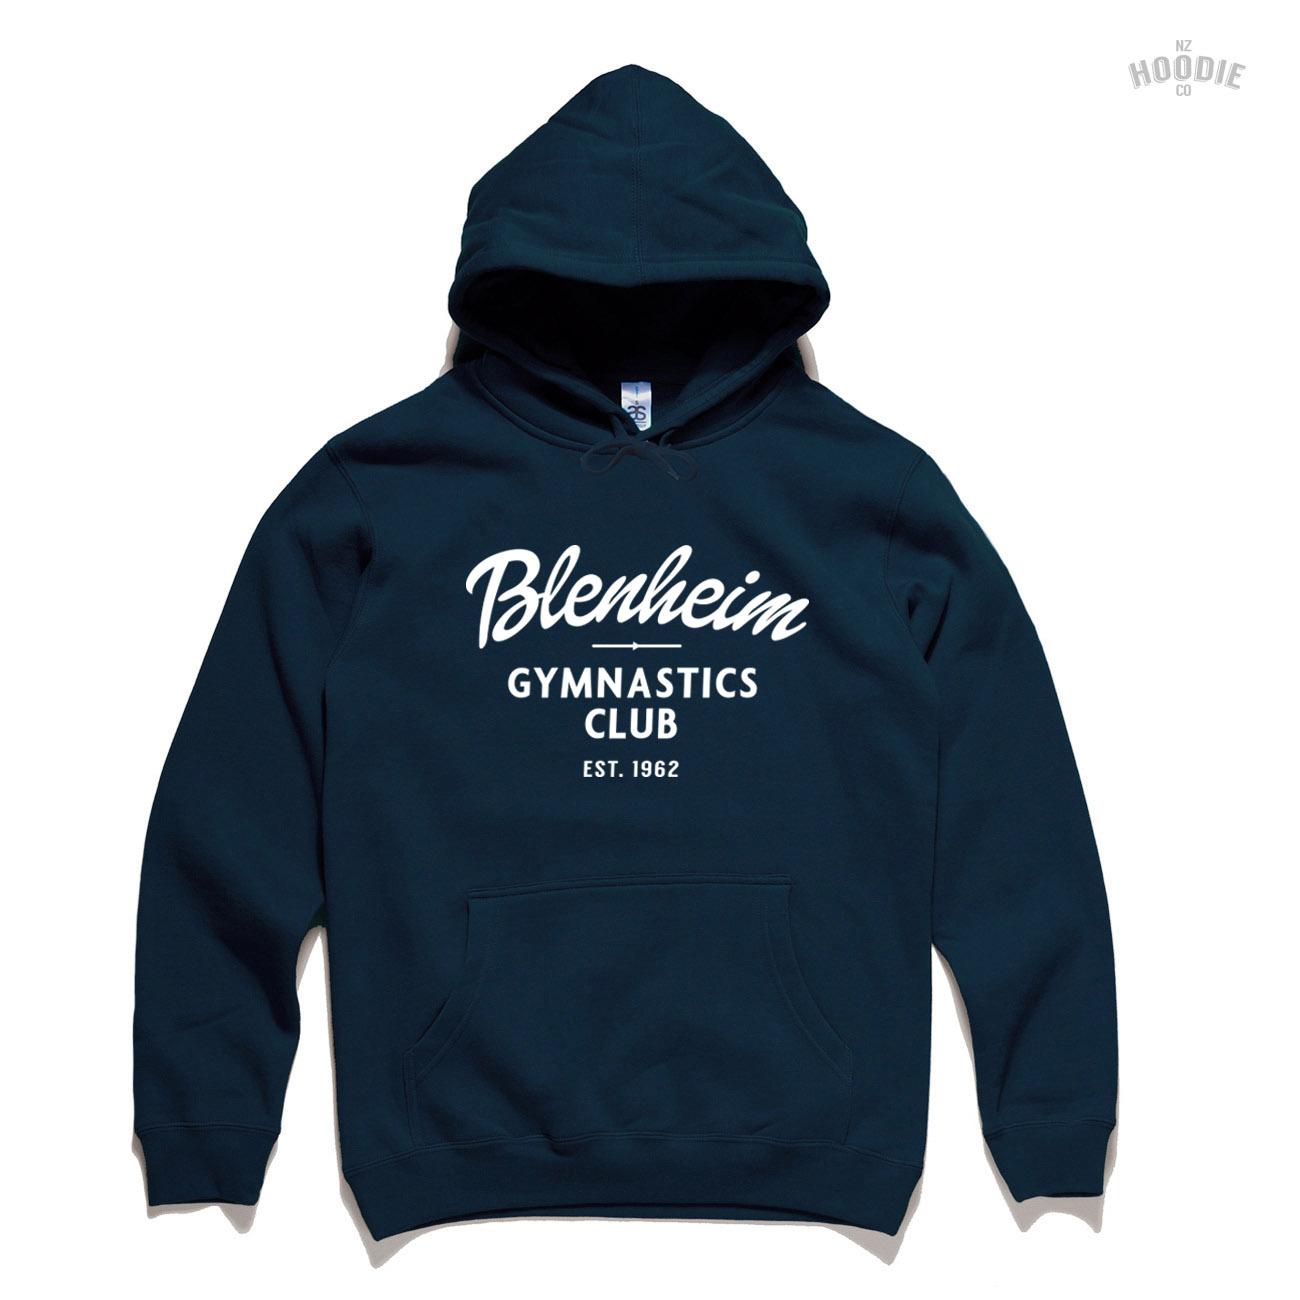 Blenheim-Gymnastics-Club-hoodie-adults-front.jpg